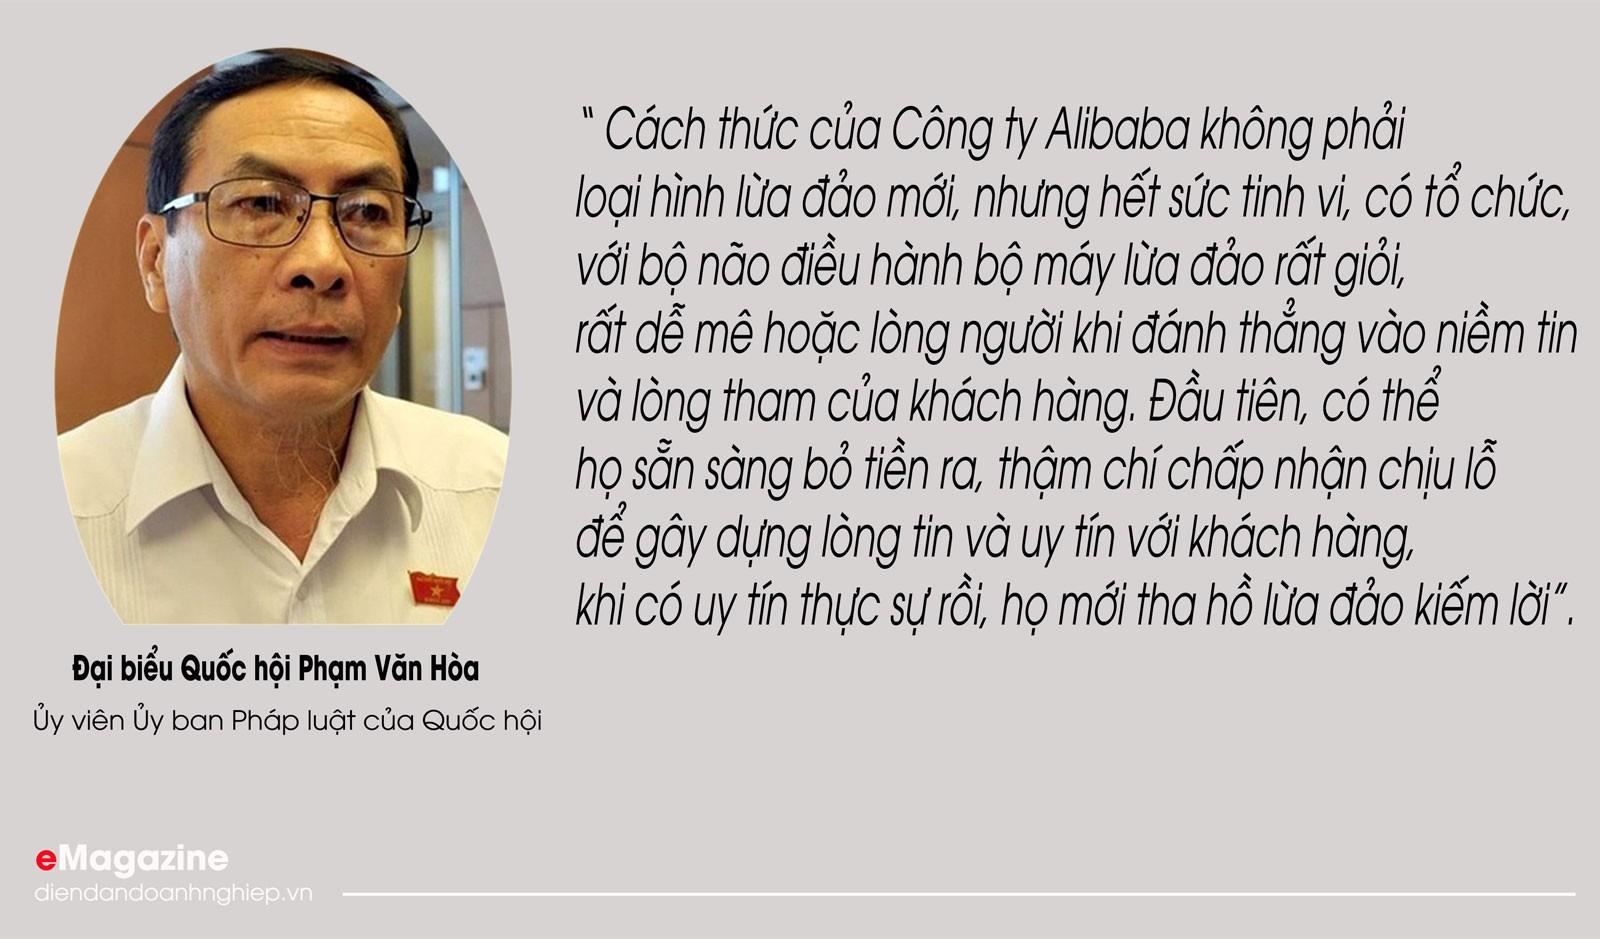 alibaba-anh-5-1627786069.jpg